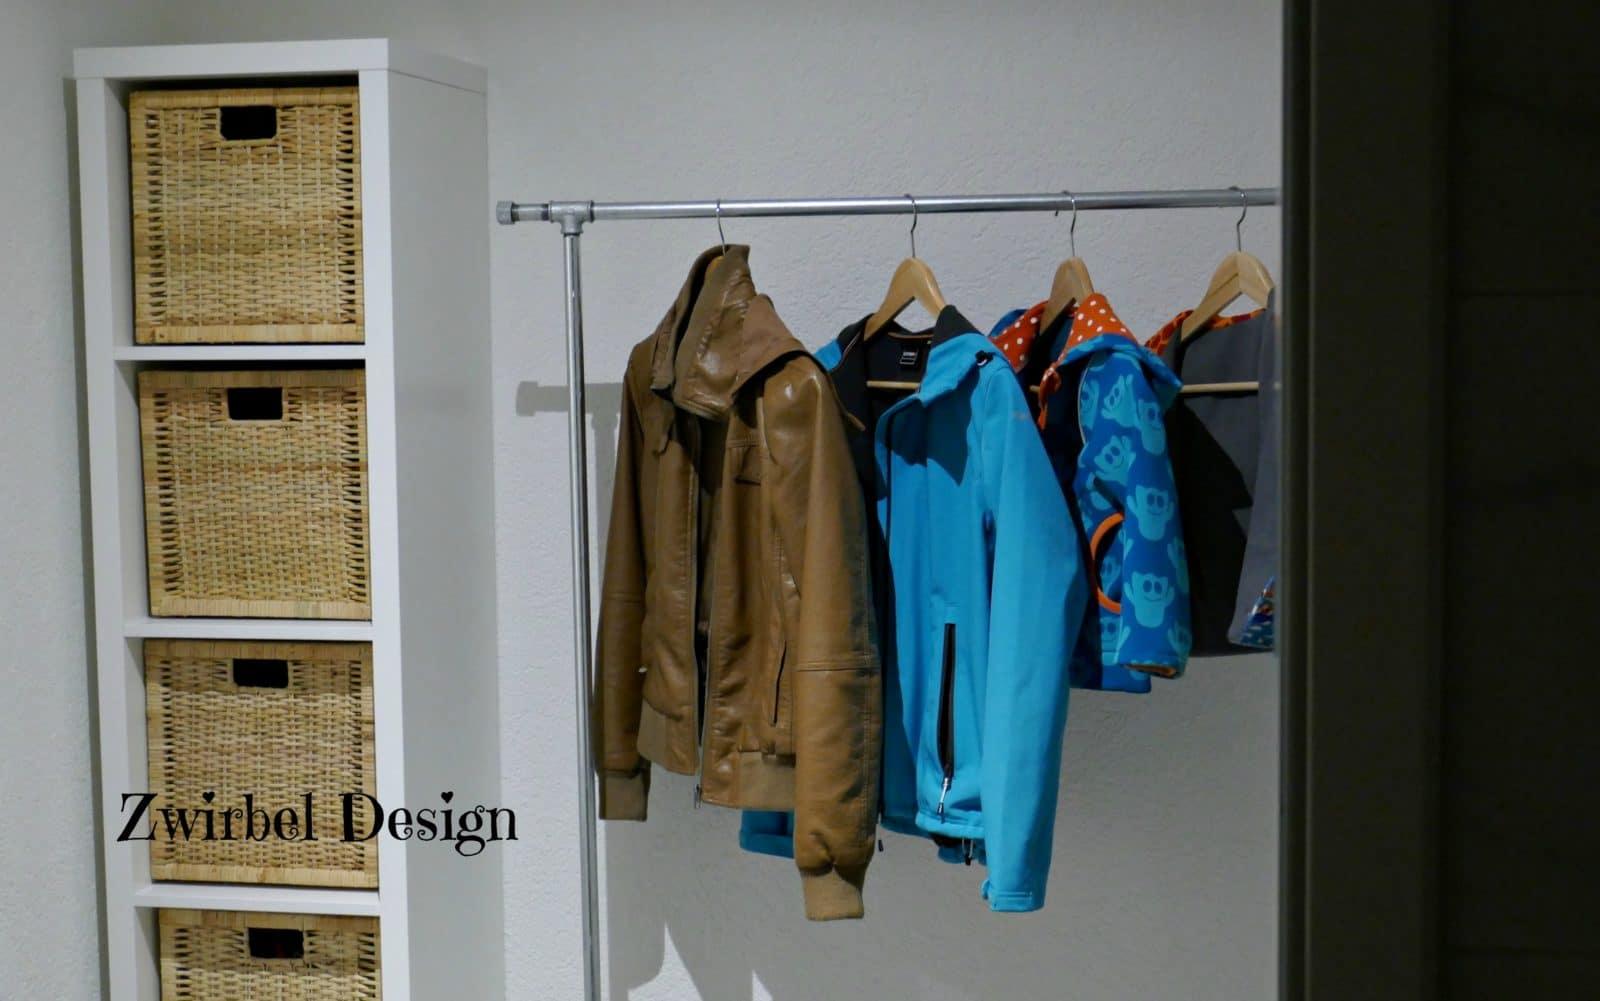 Garderobe Aus Wasserrohren Bauen Handmade Kultur